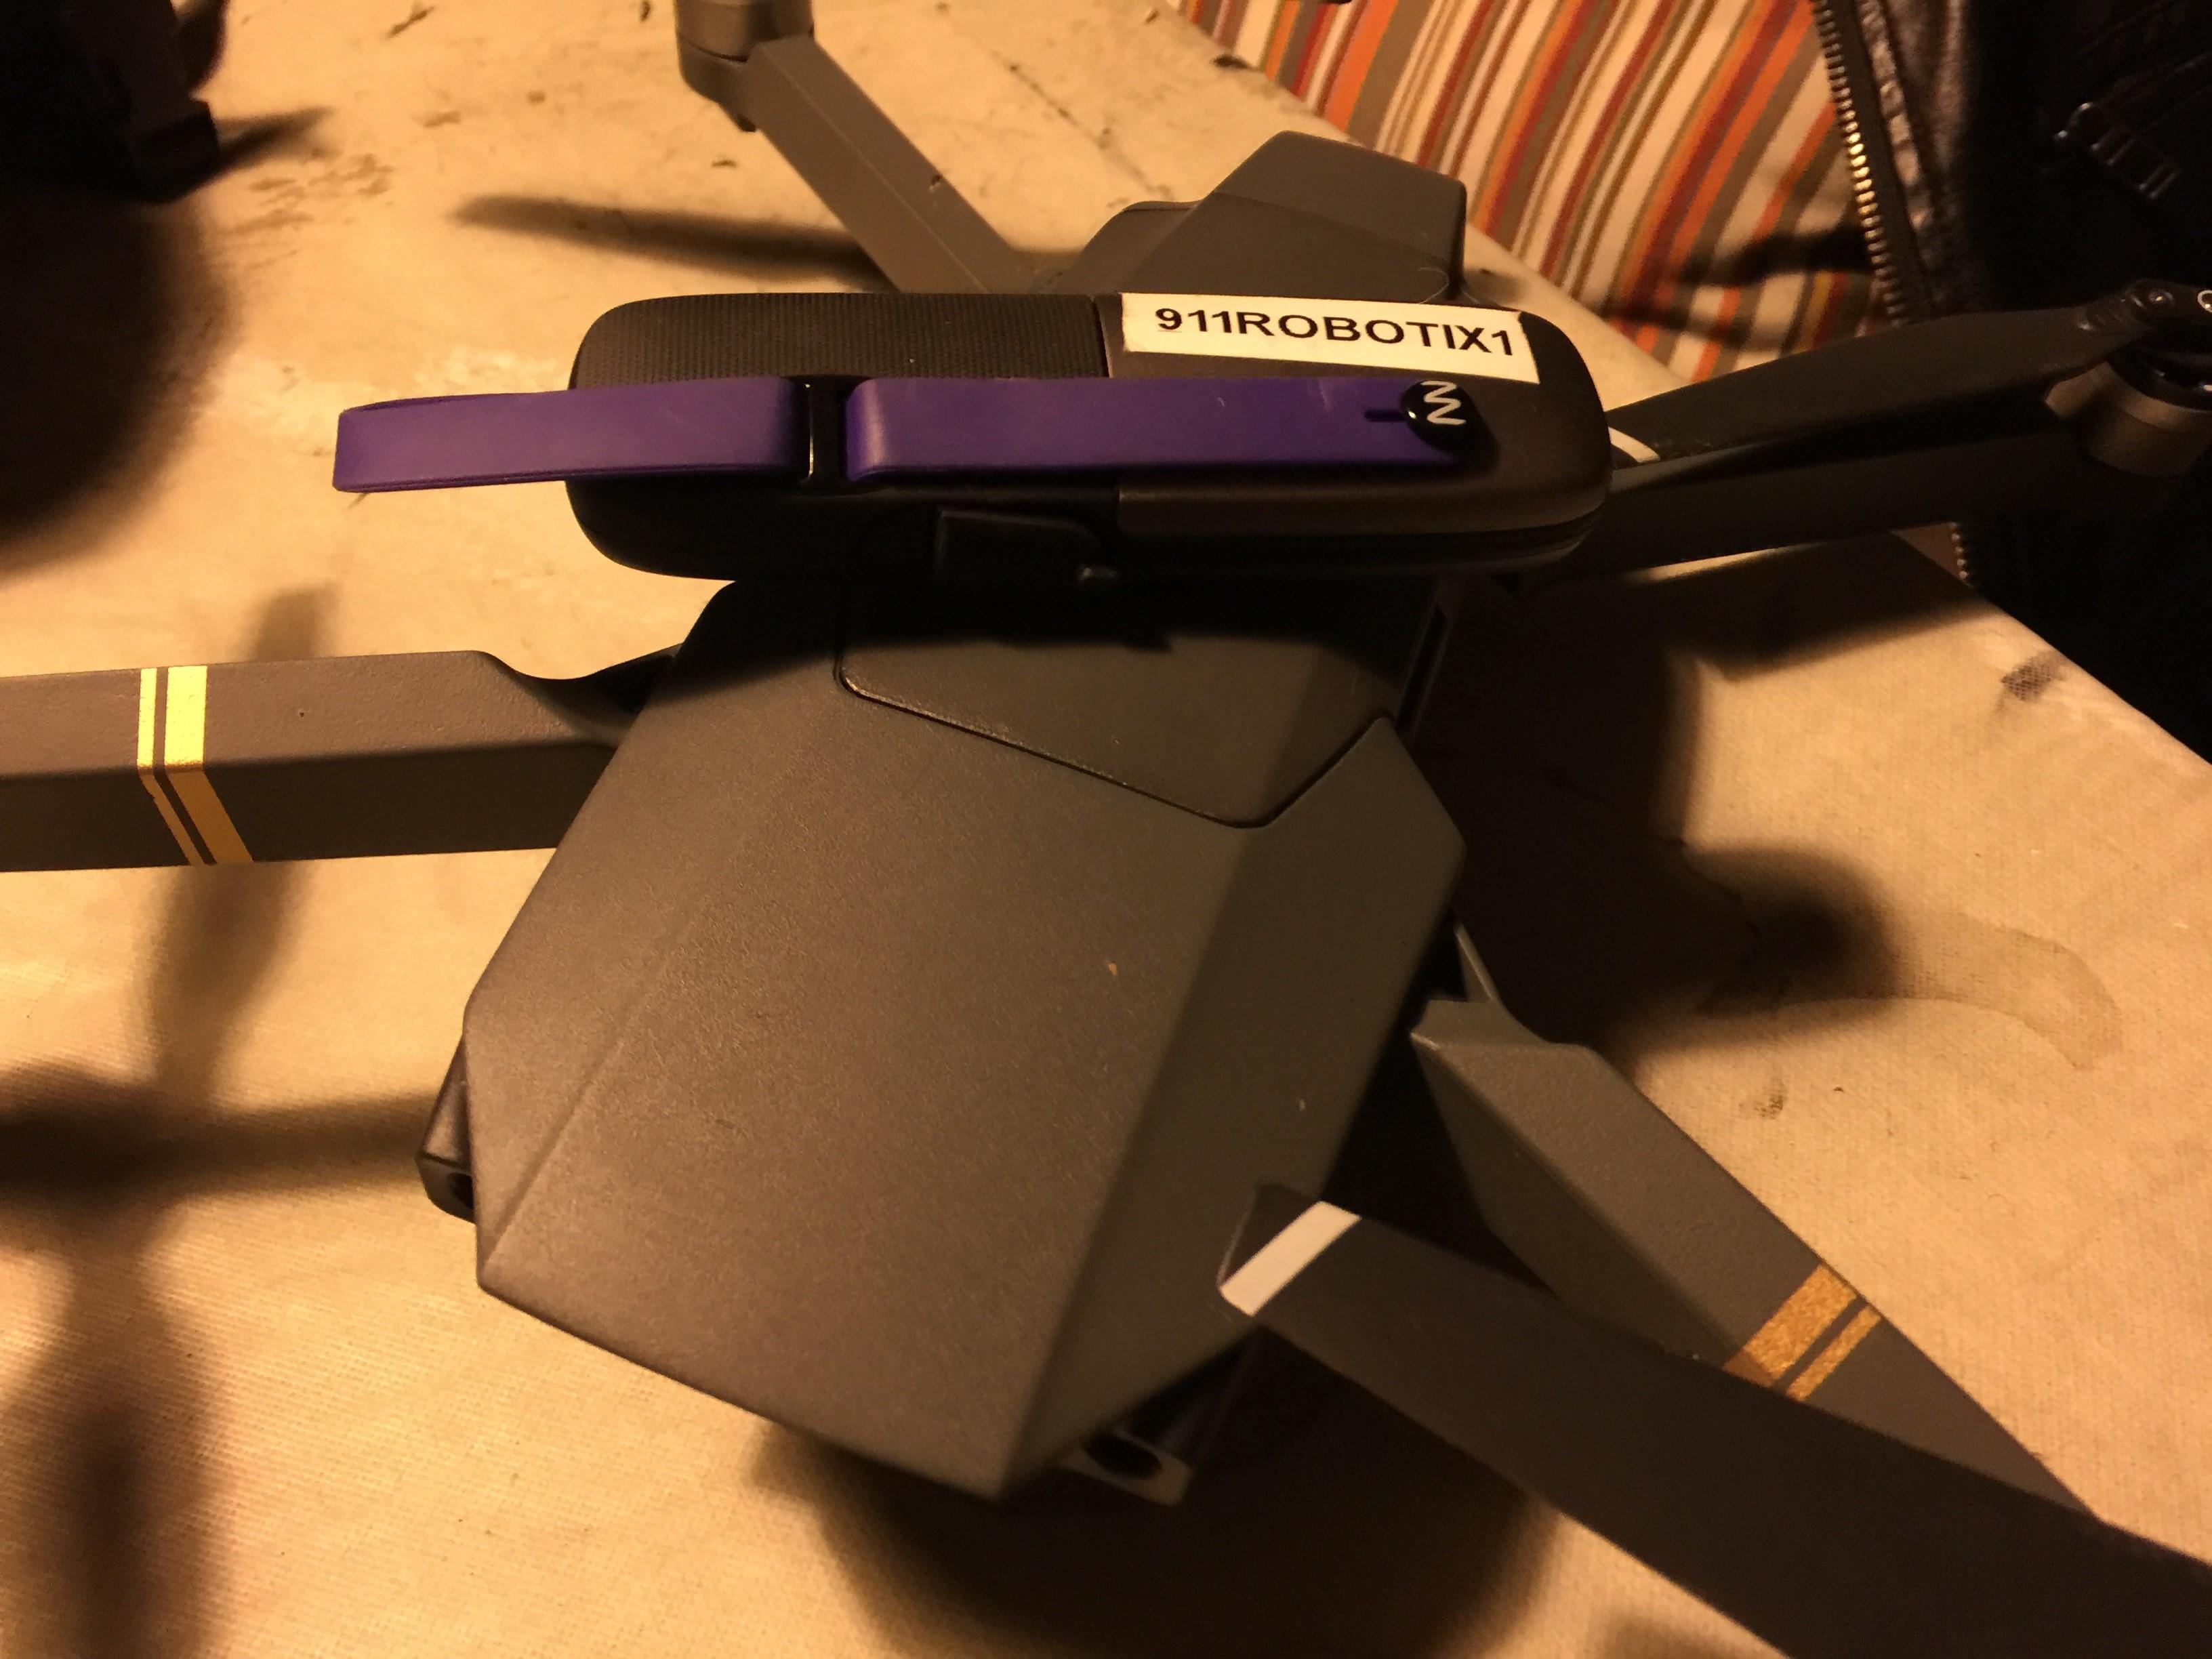 Drone-goTennaMounted